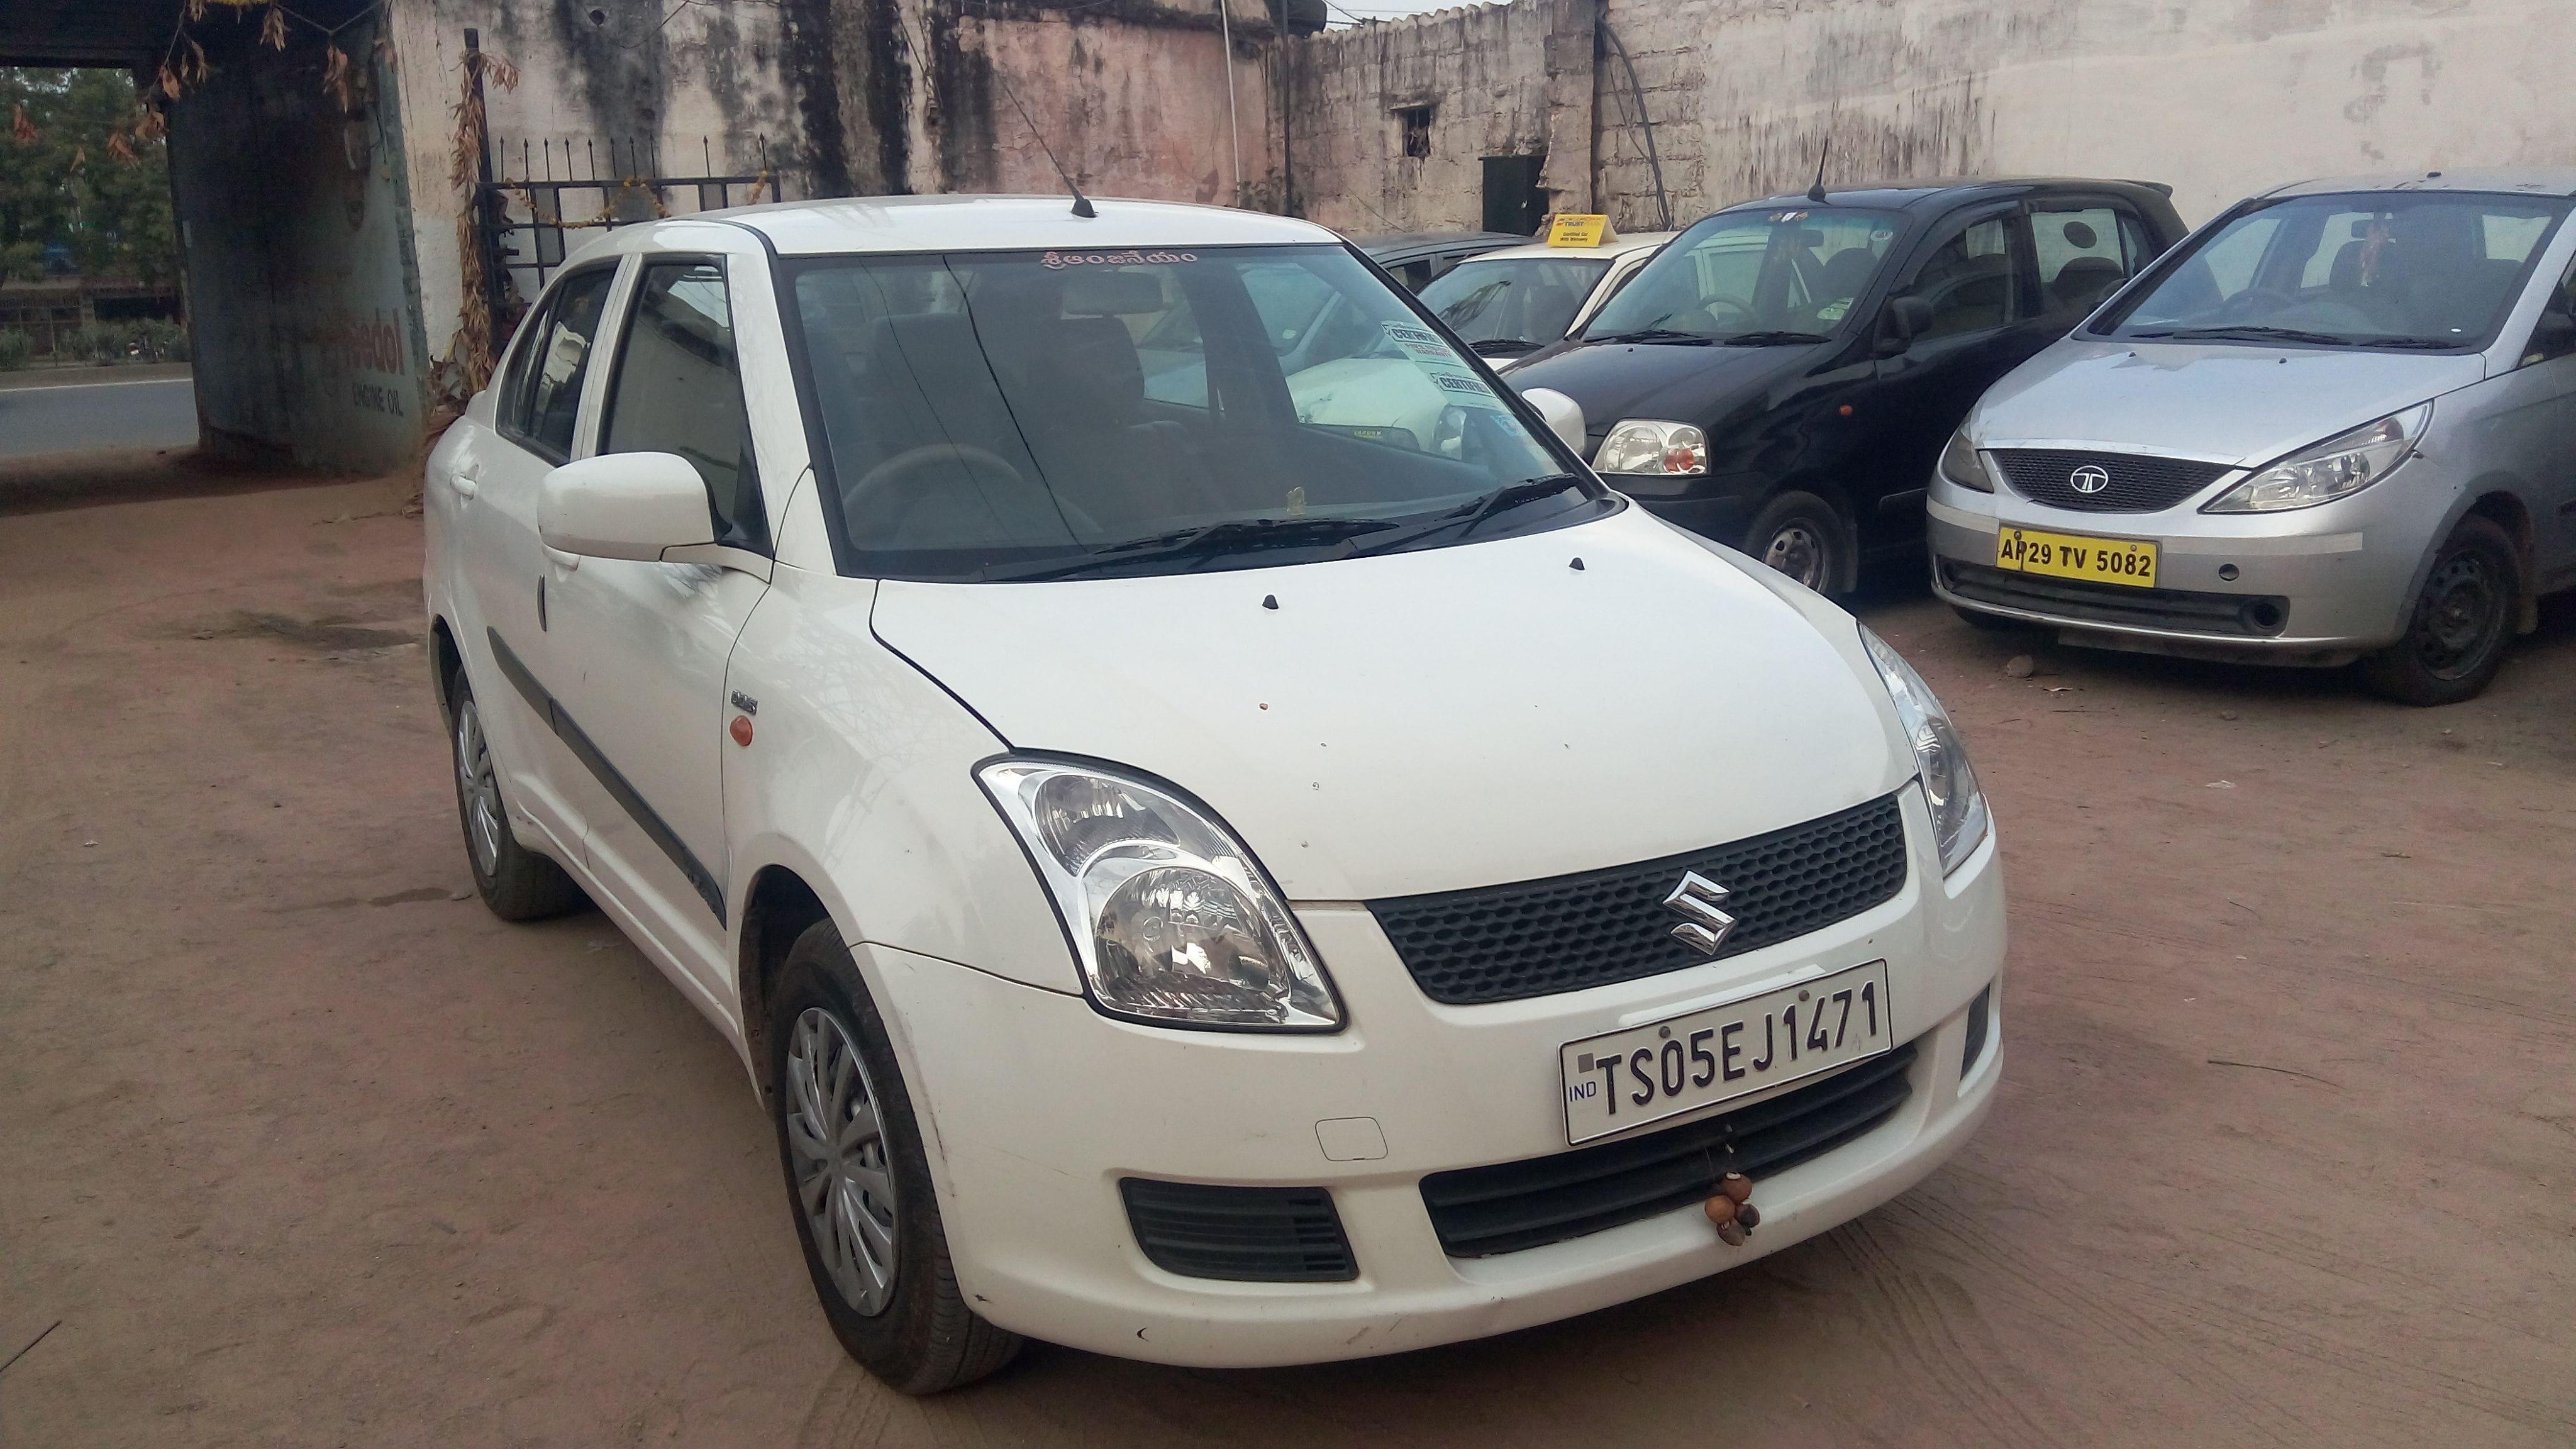 Maruti Swift Diesel Ldi Price Specs Review Pics